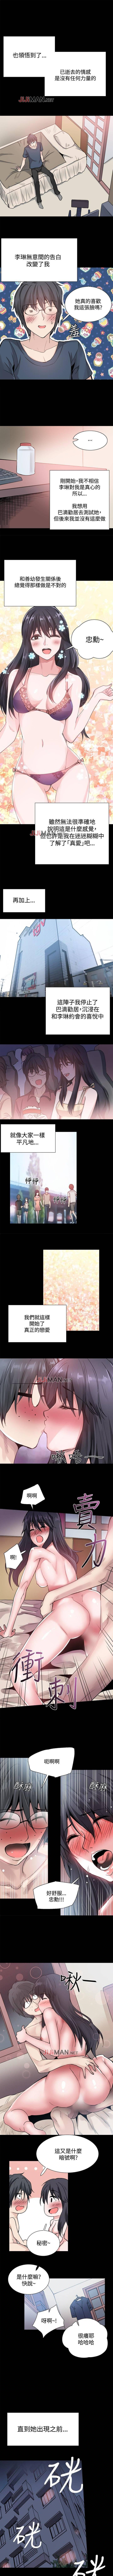 【已完结】Bodychange(作者:Seize & 死亡節奏) 第1~33话 114